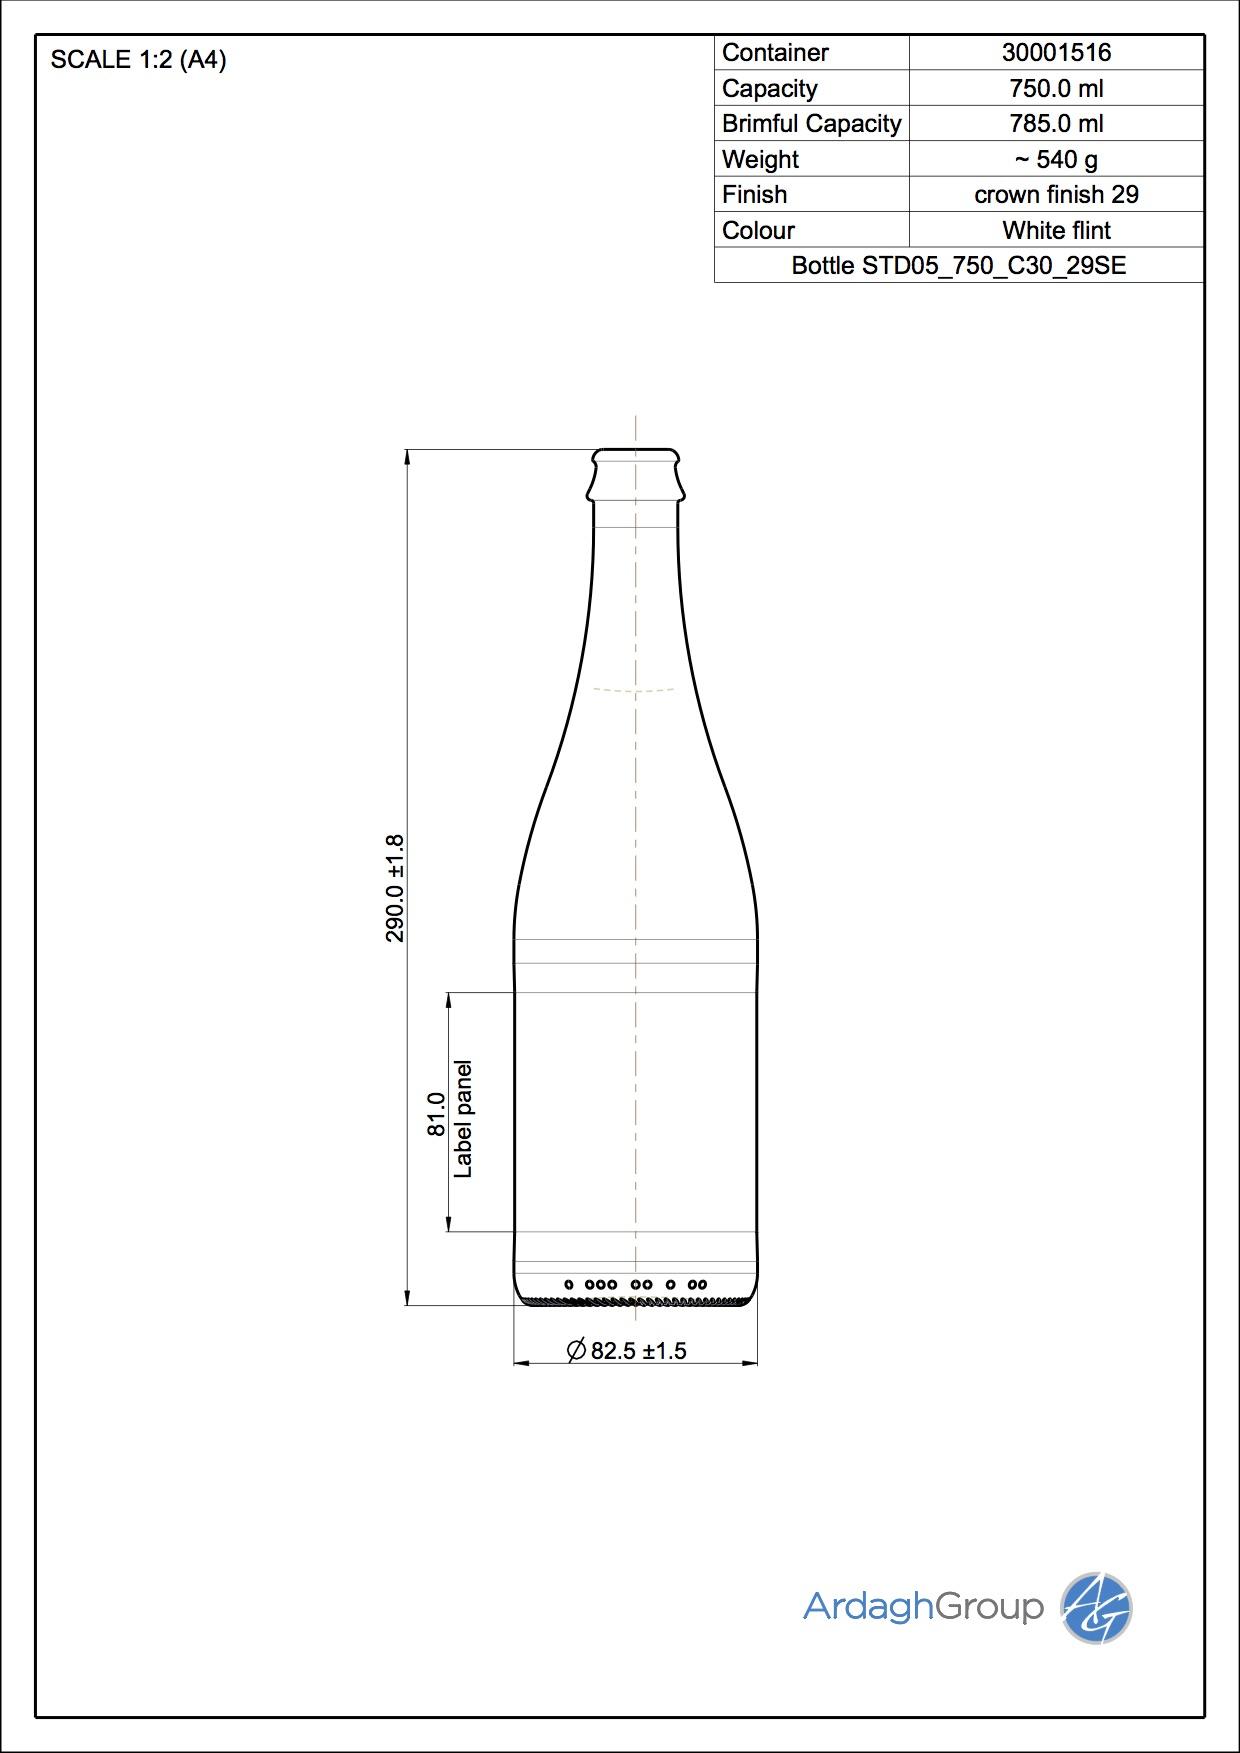 Bottle STD05 750 C30 29SE